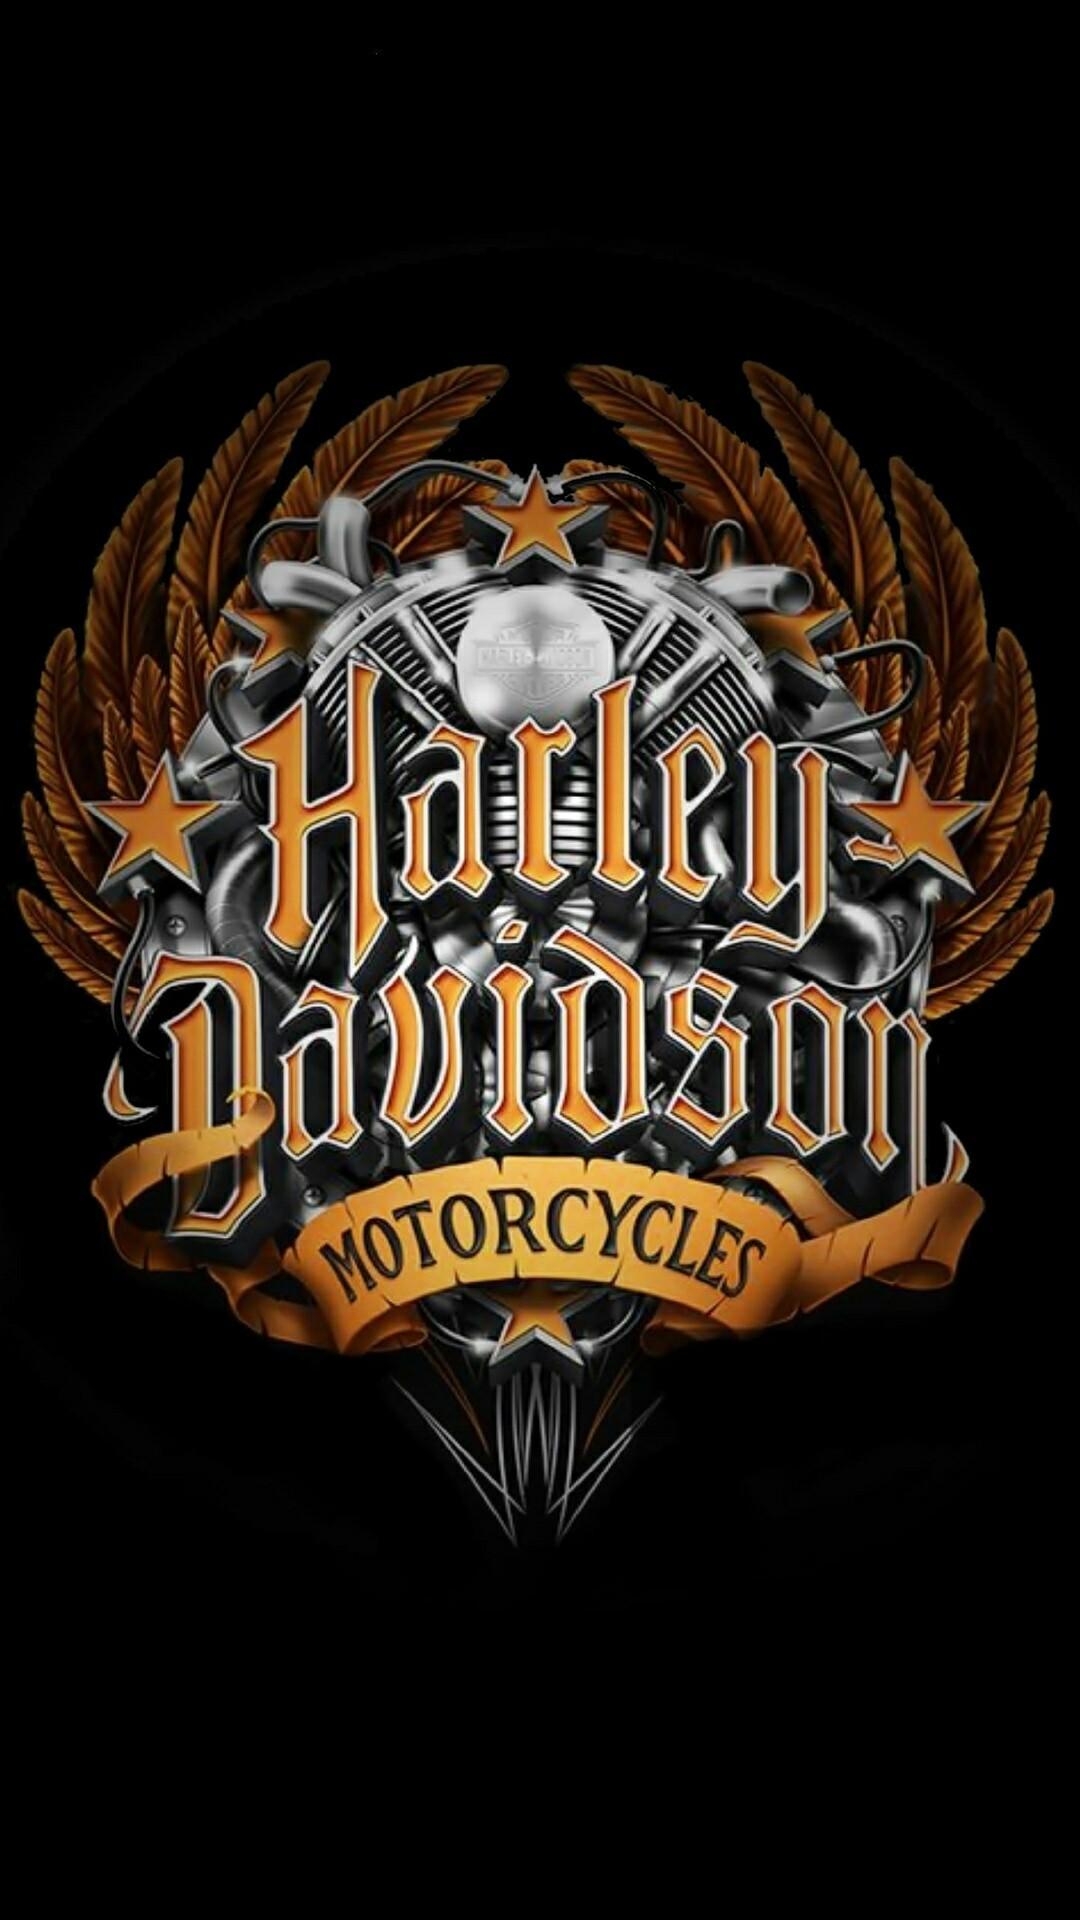 harley davidson wallpaper hd 74 images